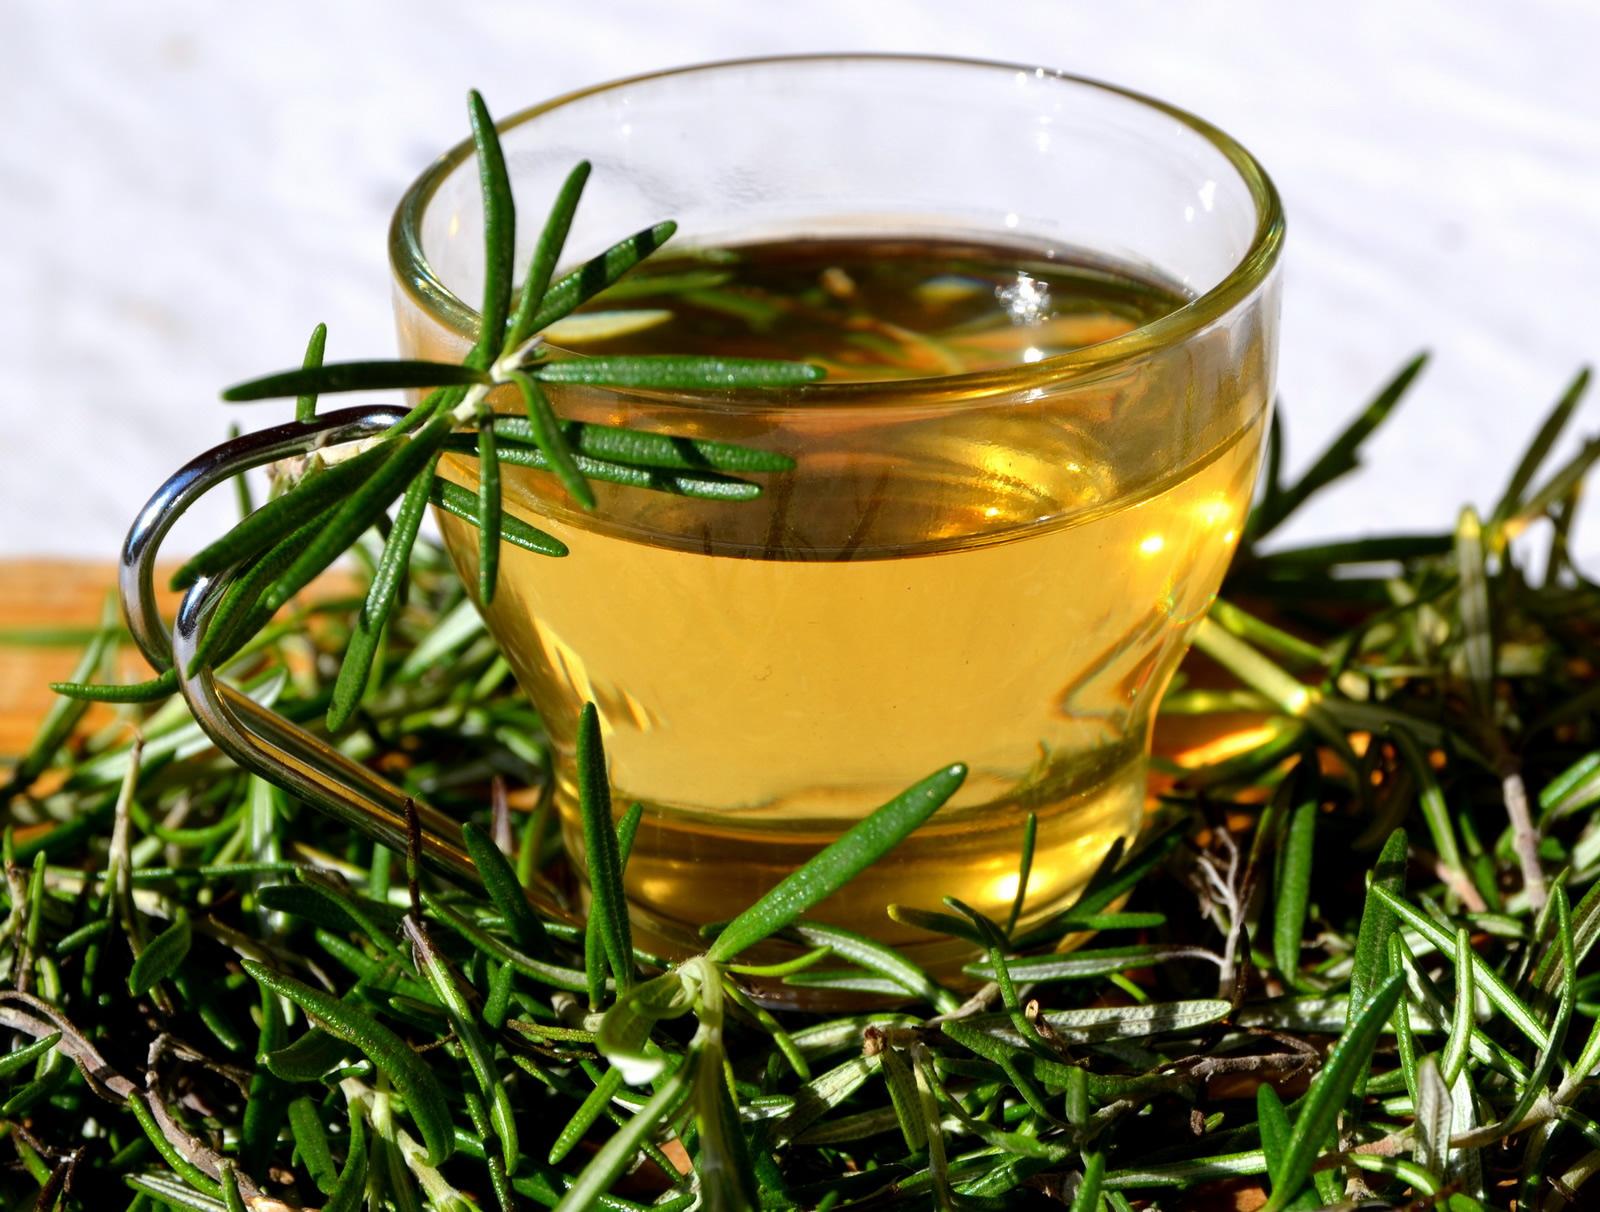 Rosemary Herbal Tea Gaia Therapeat